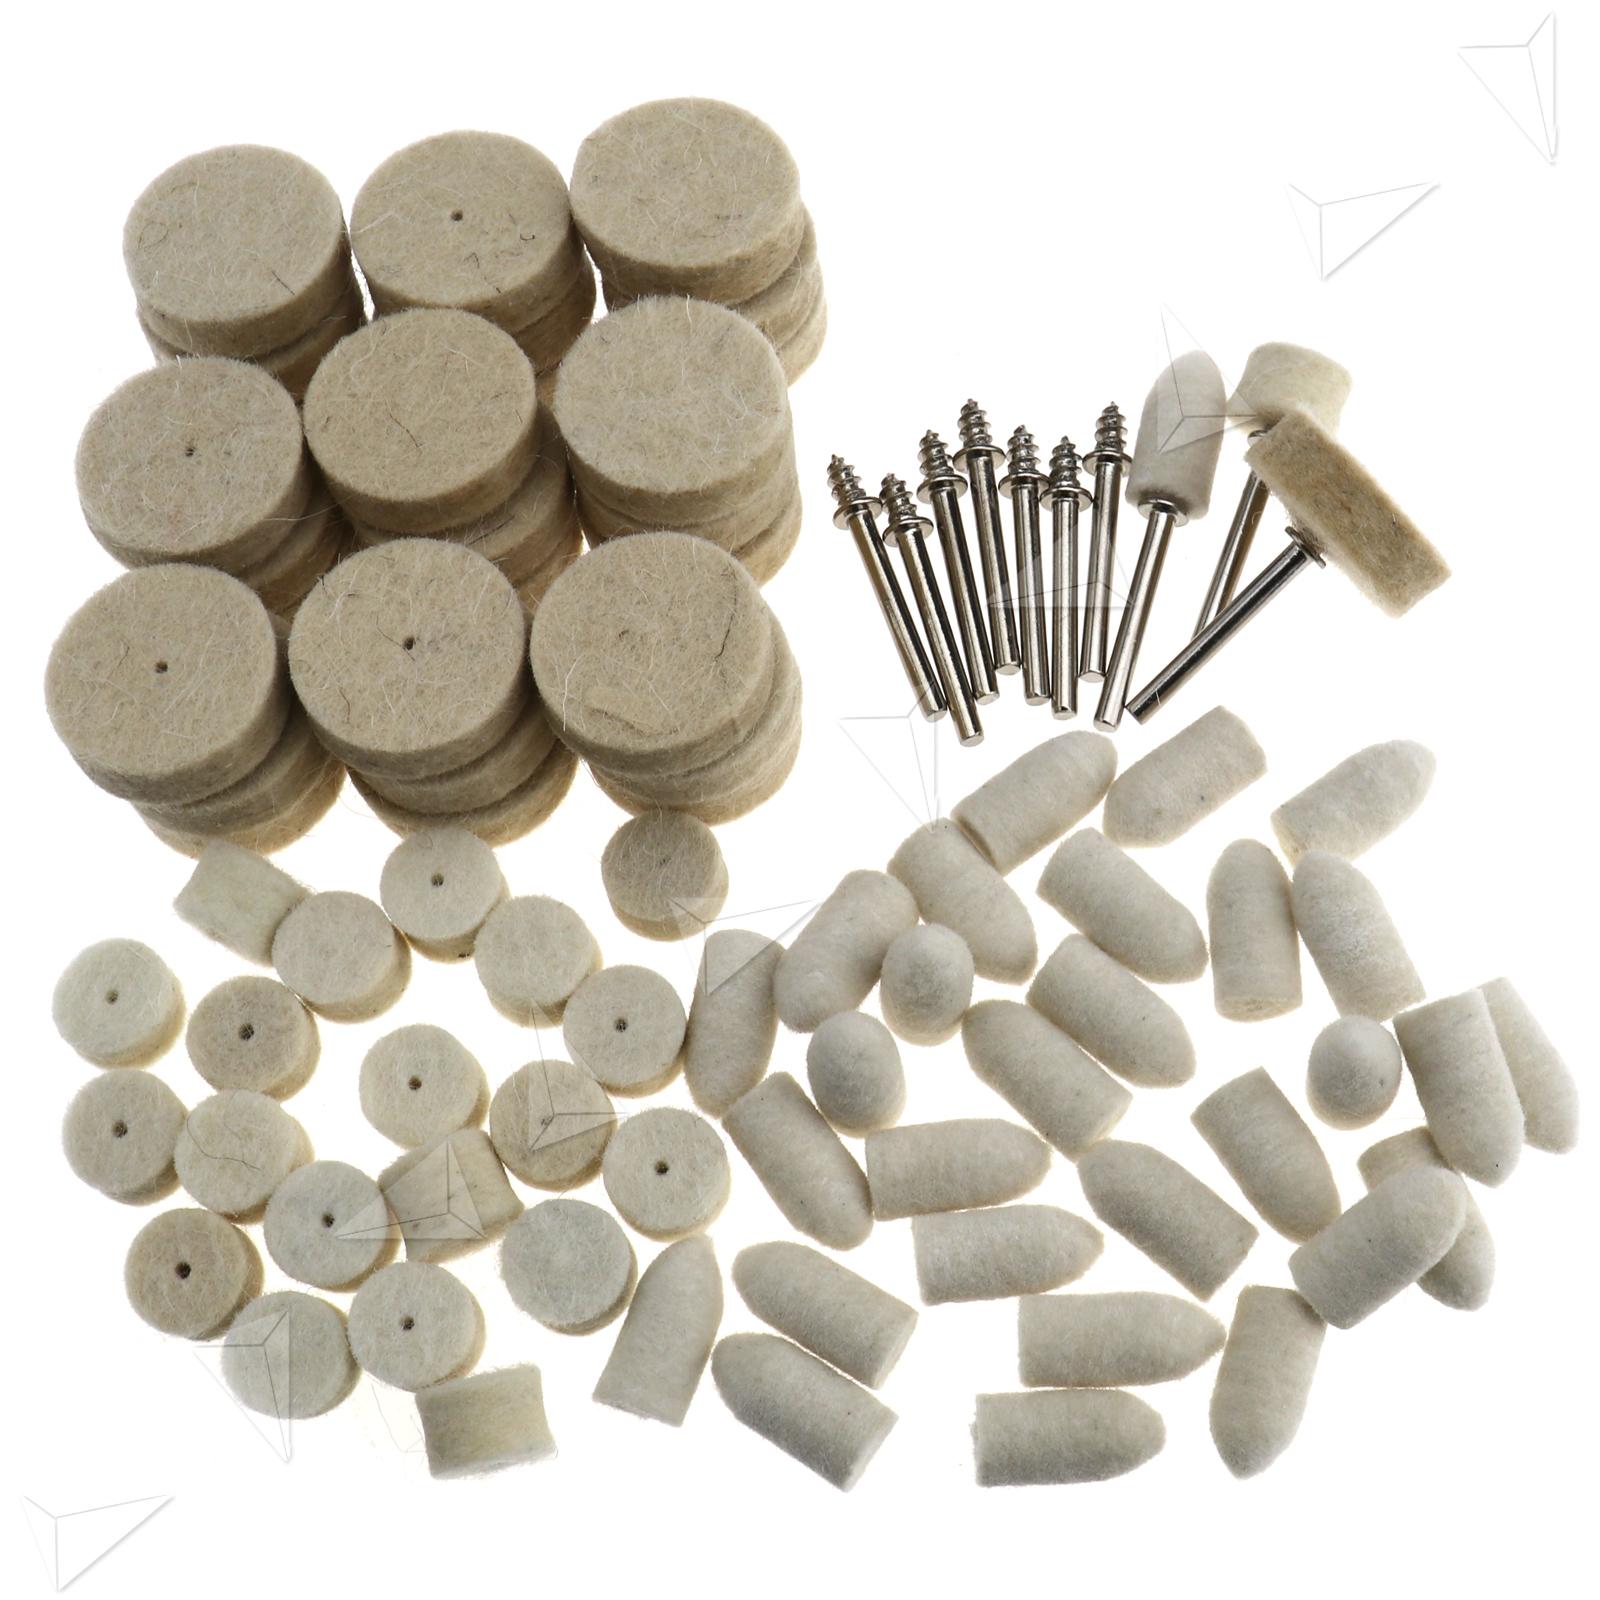 1x Sponge Cone Metal Polishing Foam Pad Wool Buffing: Set Felt Polishing Pad Buff Clean Wheels + Point Mandrel